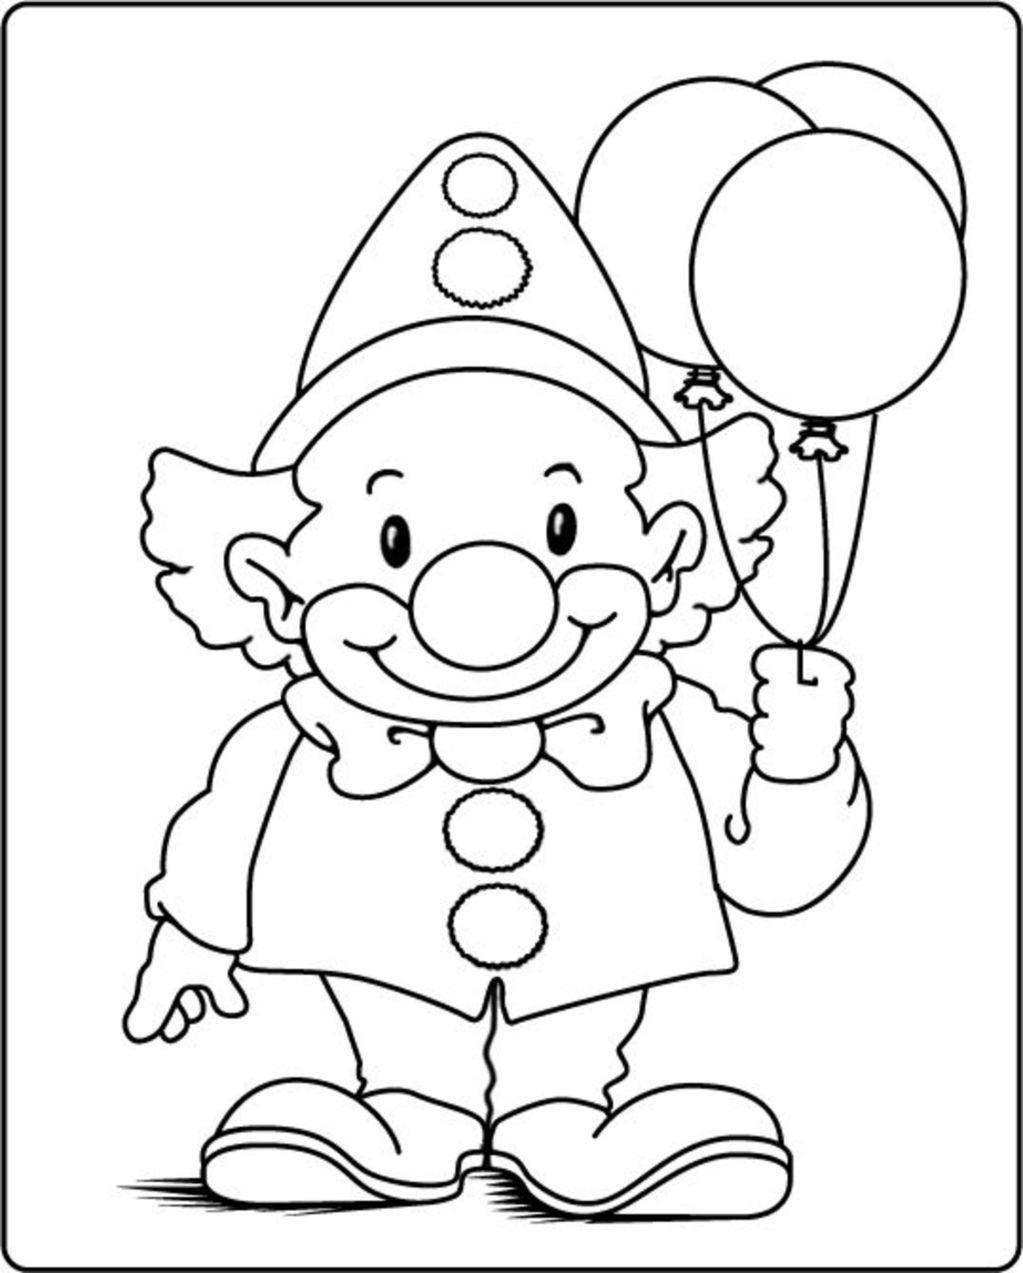 Free Clown Bilder, Download Free Clip Art, Free Clip Art on